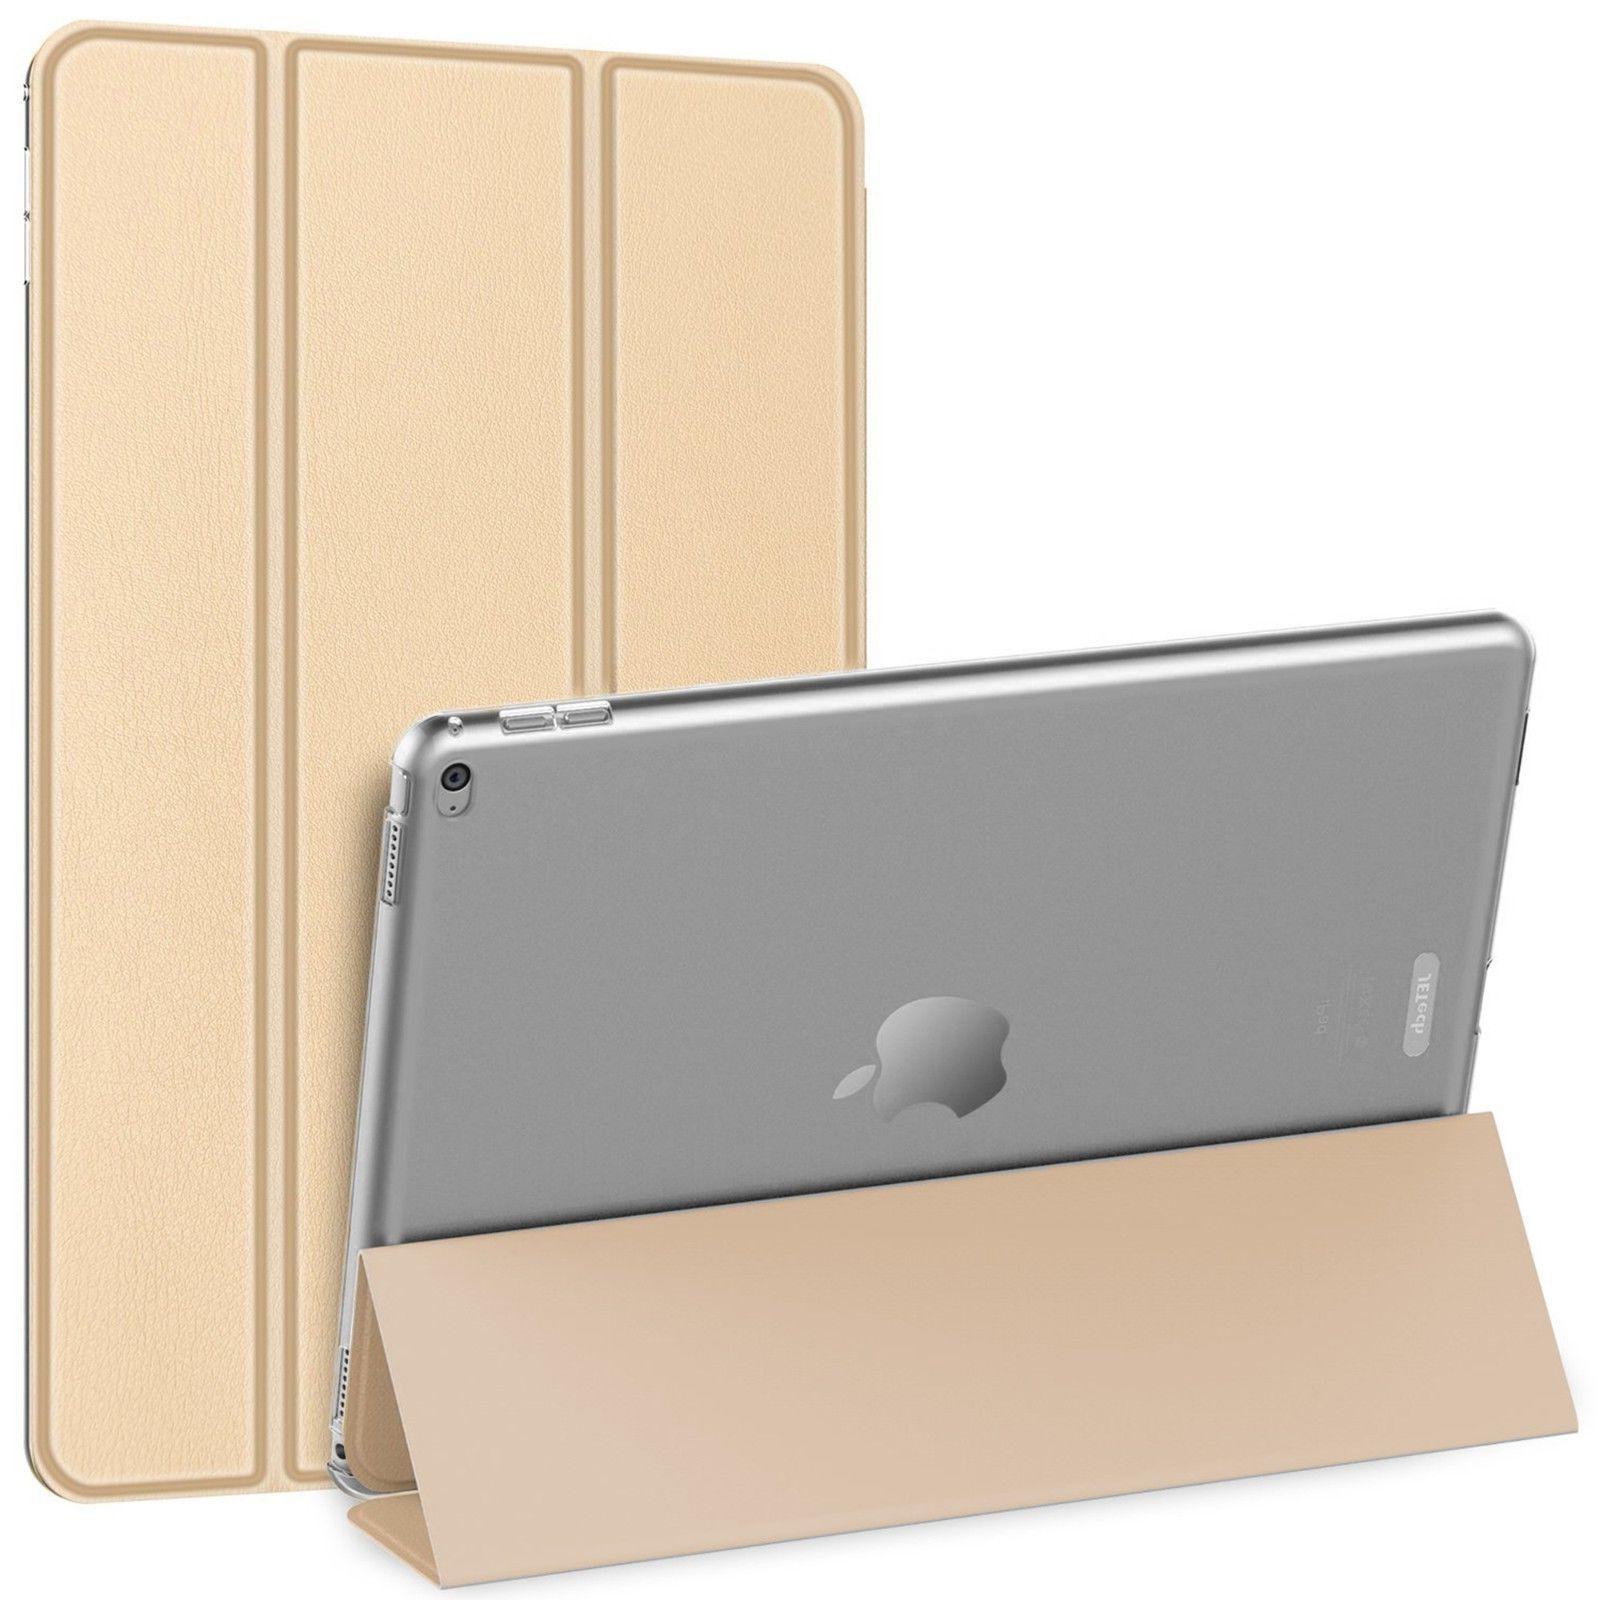 JETech Case for Apple iPad Pro 12.9  Smart Cover Auto Sleep/